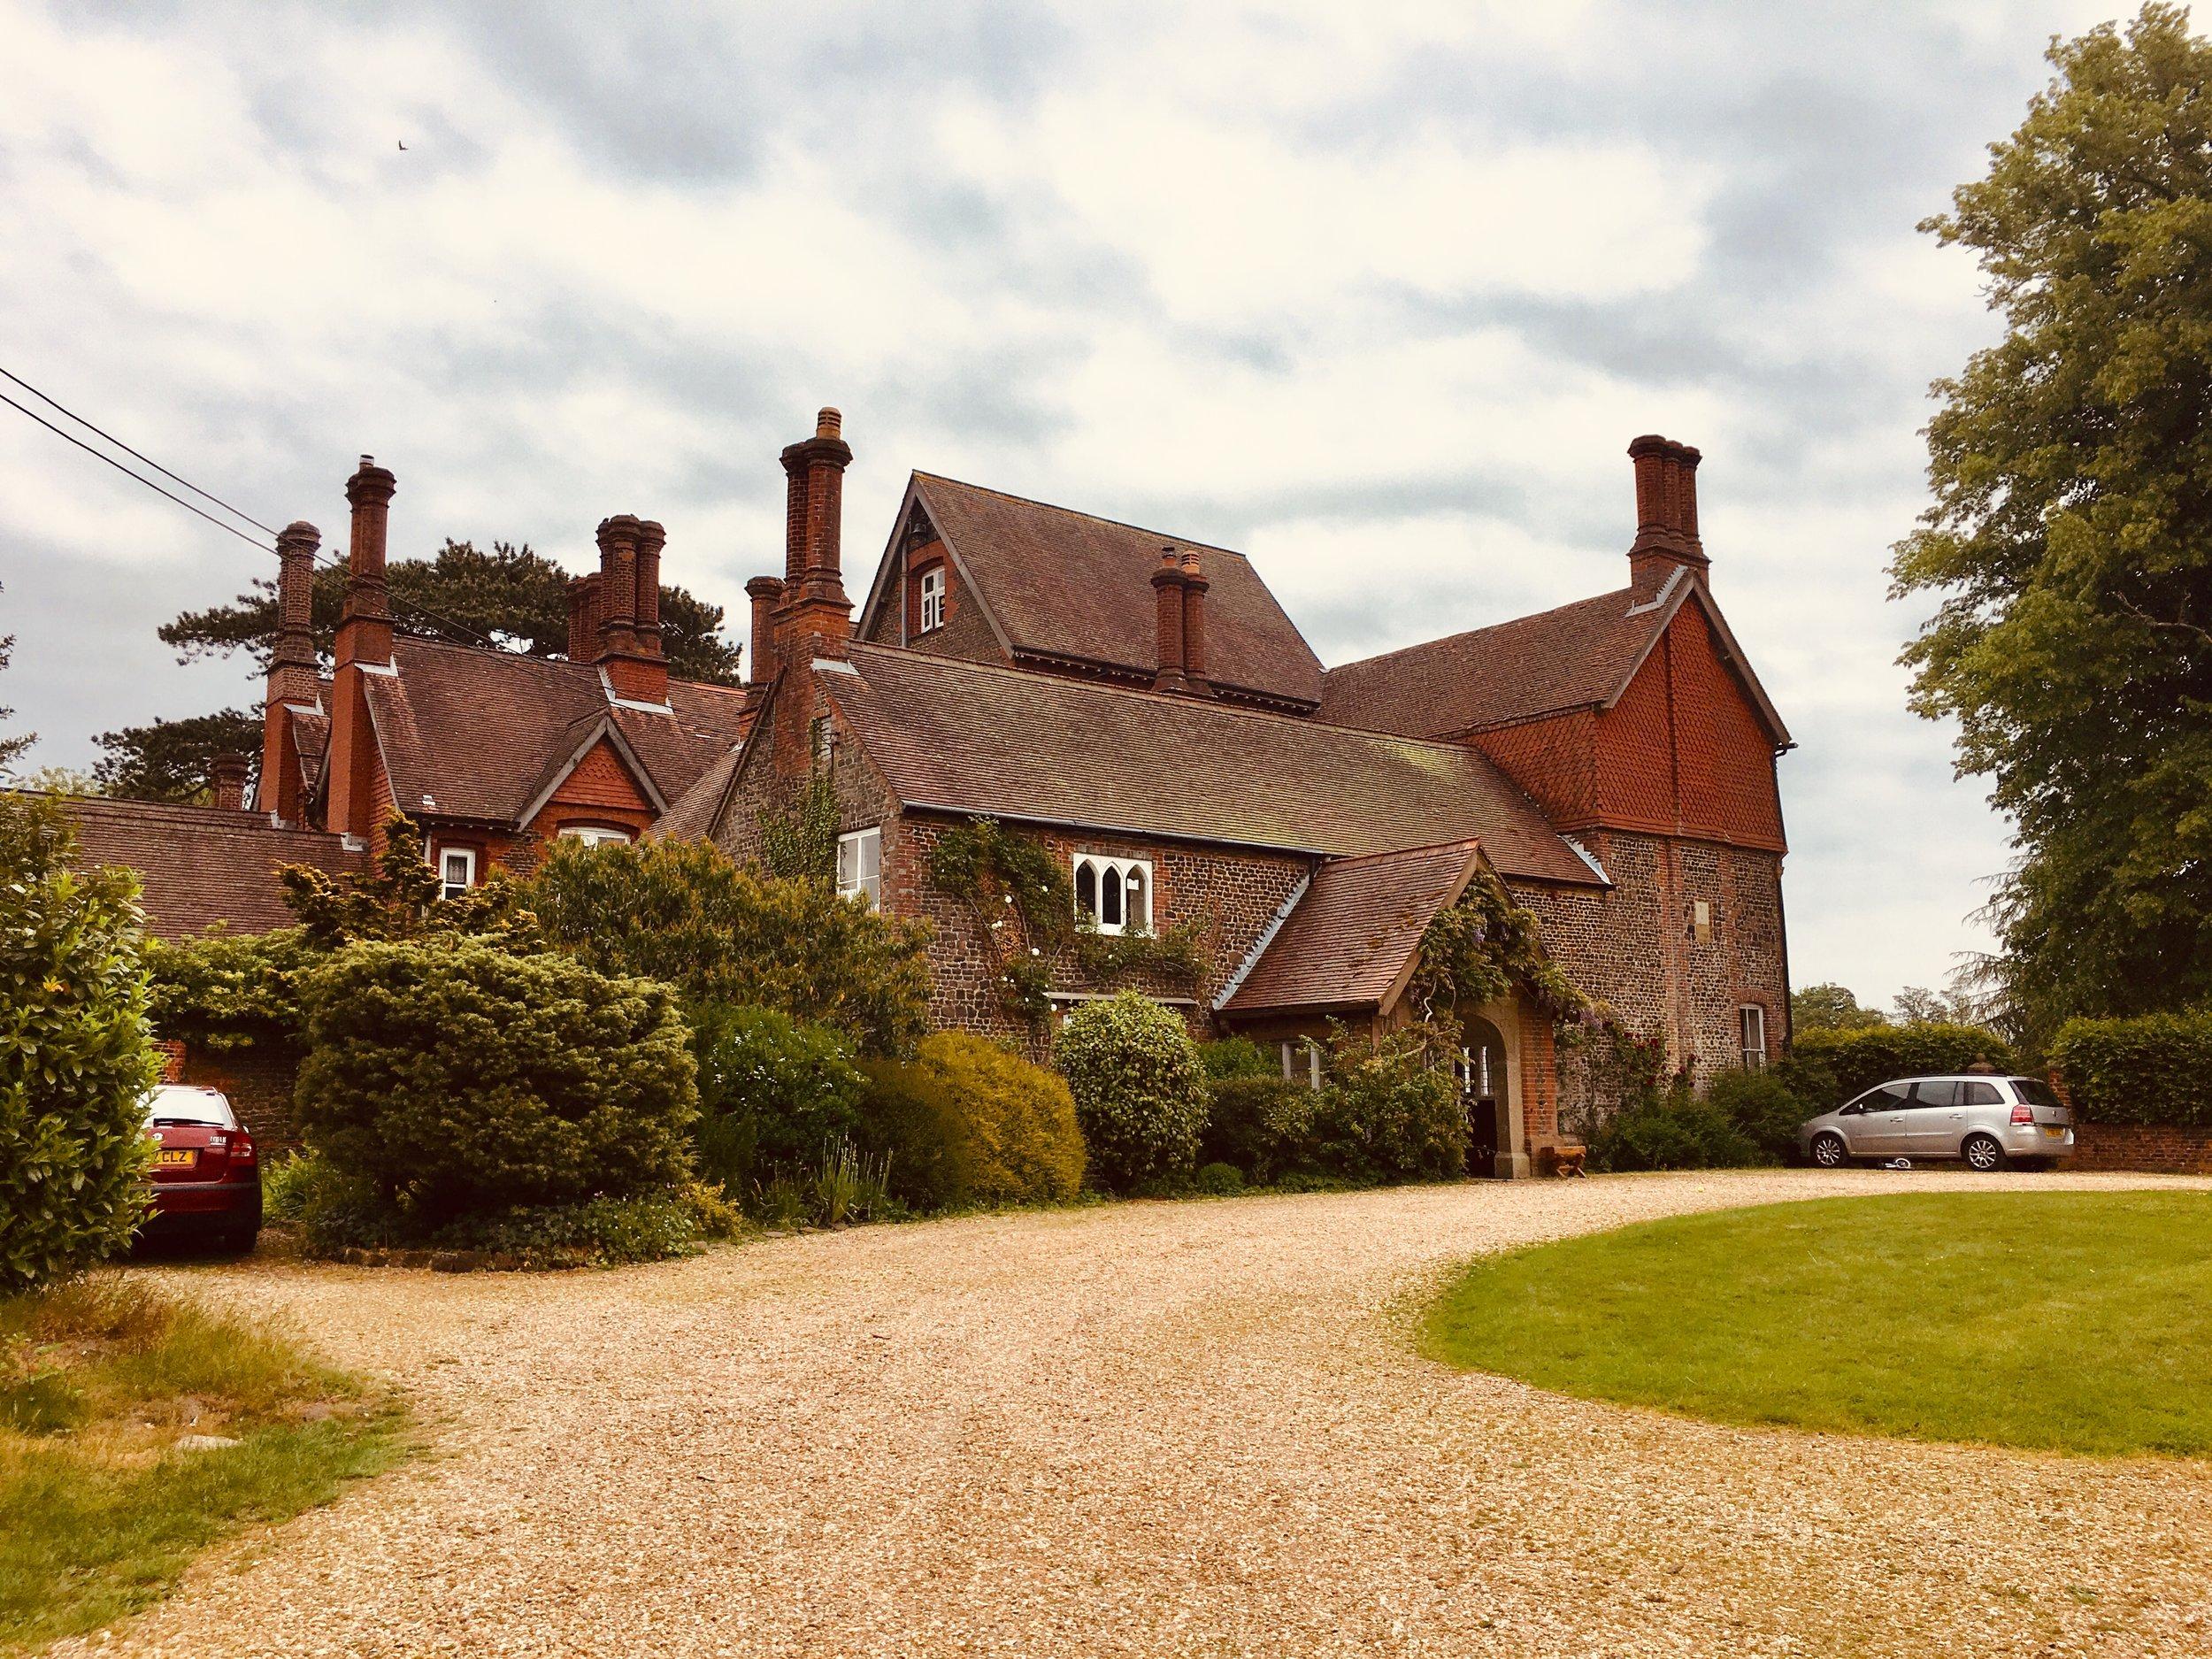 The Manor House, Greatham England